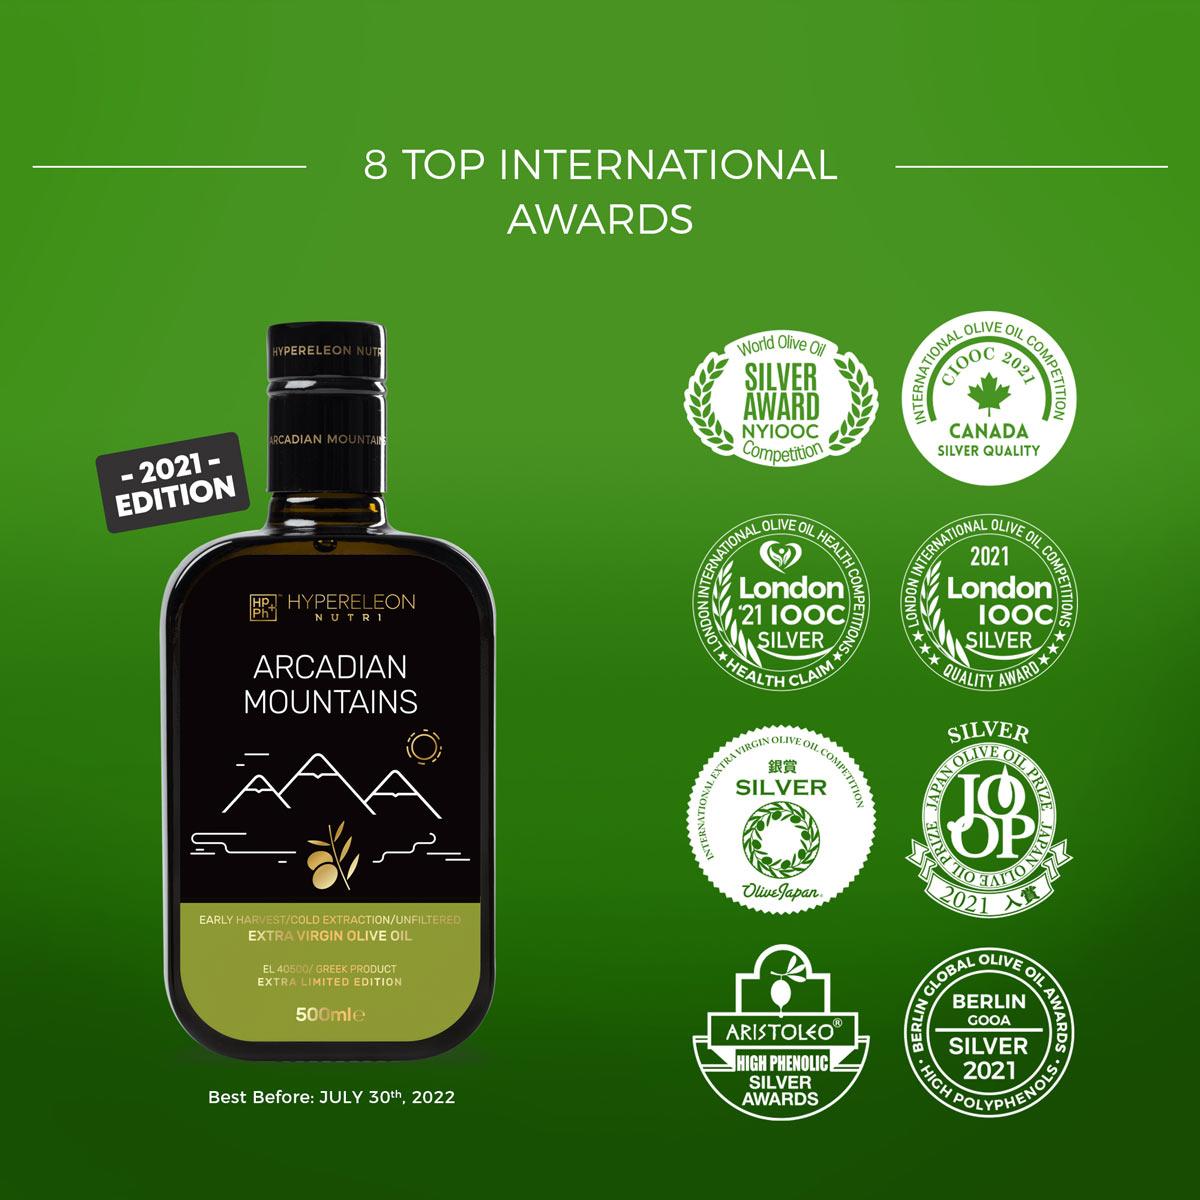 hypereleon nutri awards